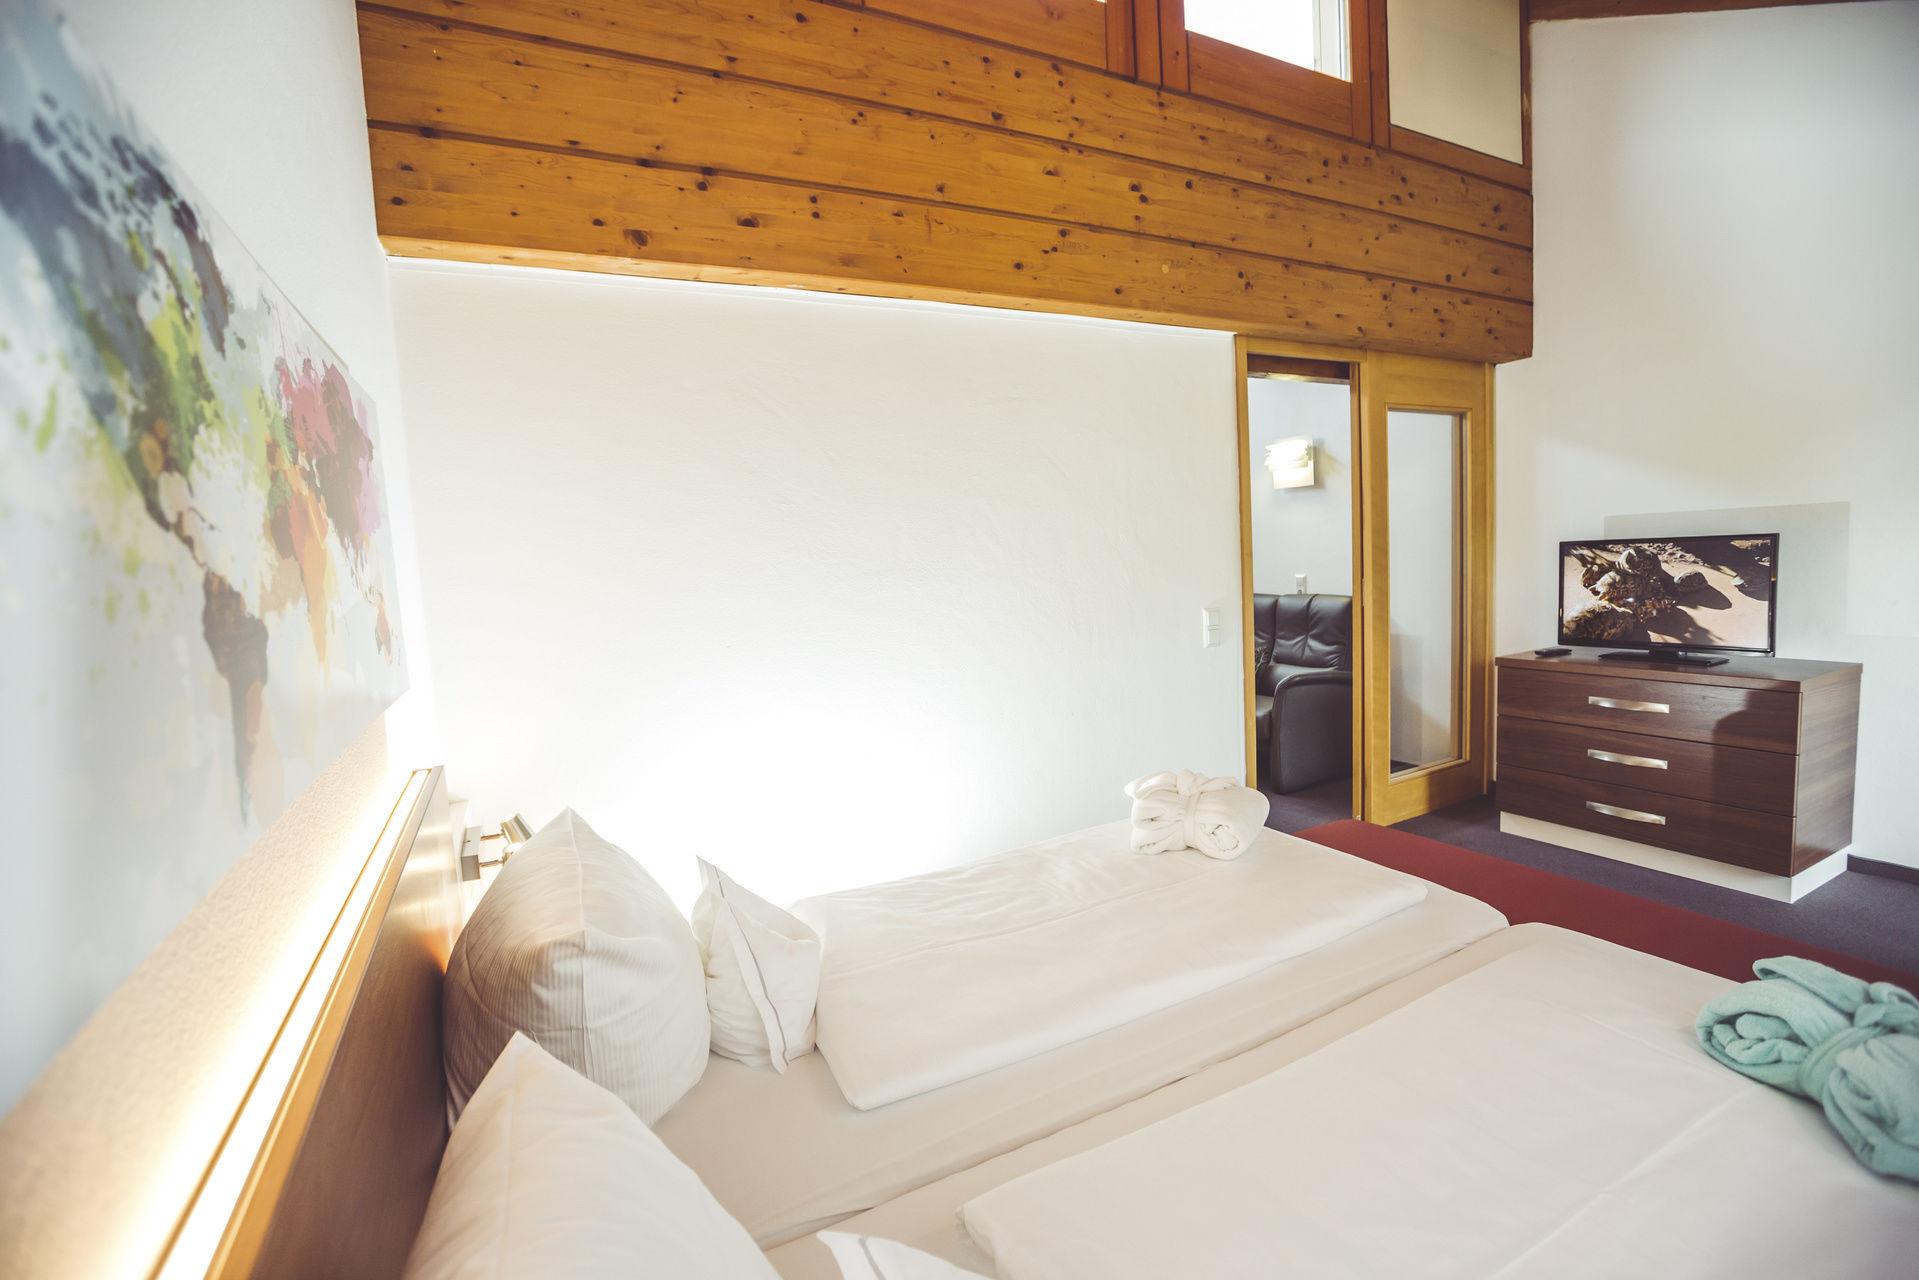 Hotelzimmer 4 Sterne Hotel Amp Appartementhof Waldeck Bad